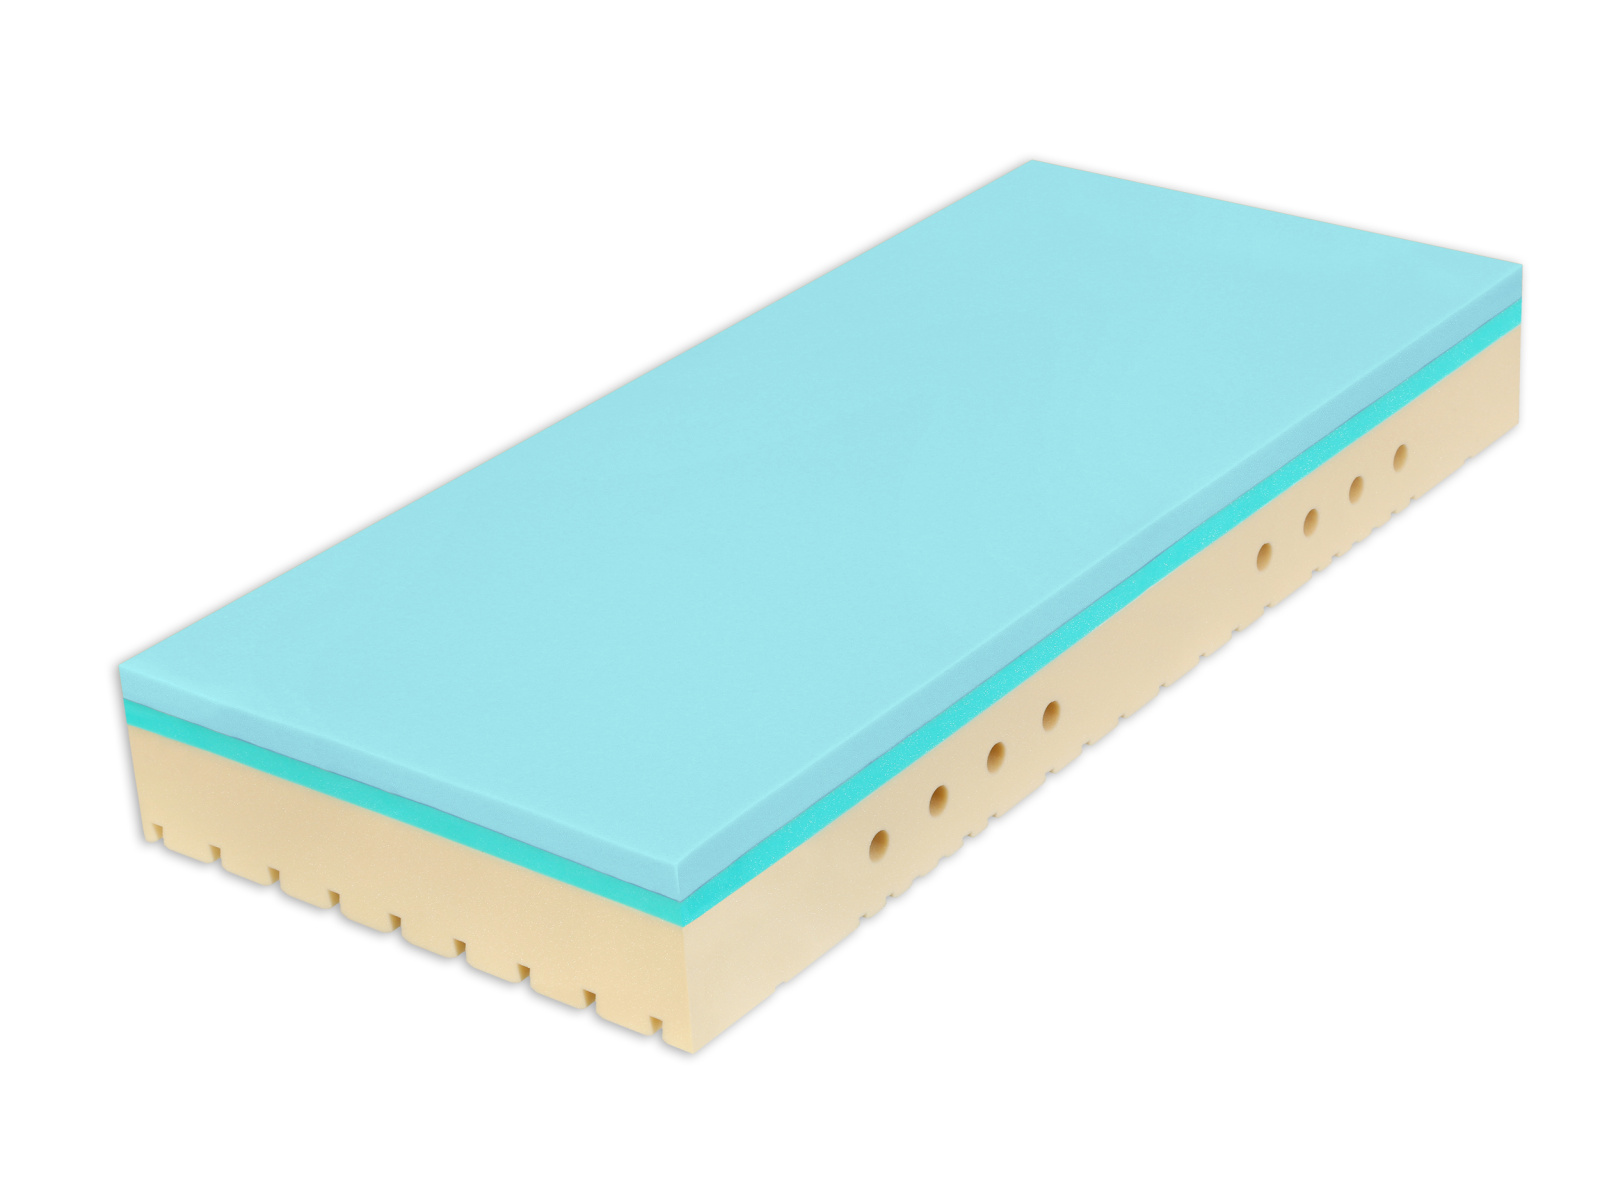 Matrace SUPER FOX BLUE Classic 80x200x20 cm, 1+1 ZDARMA